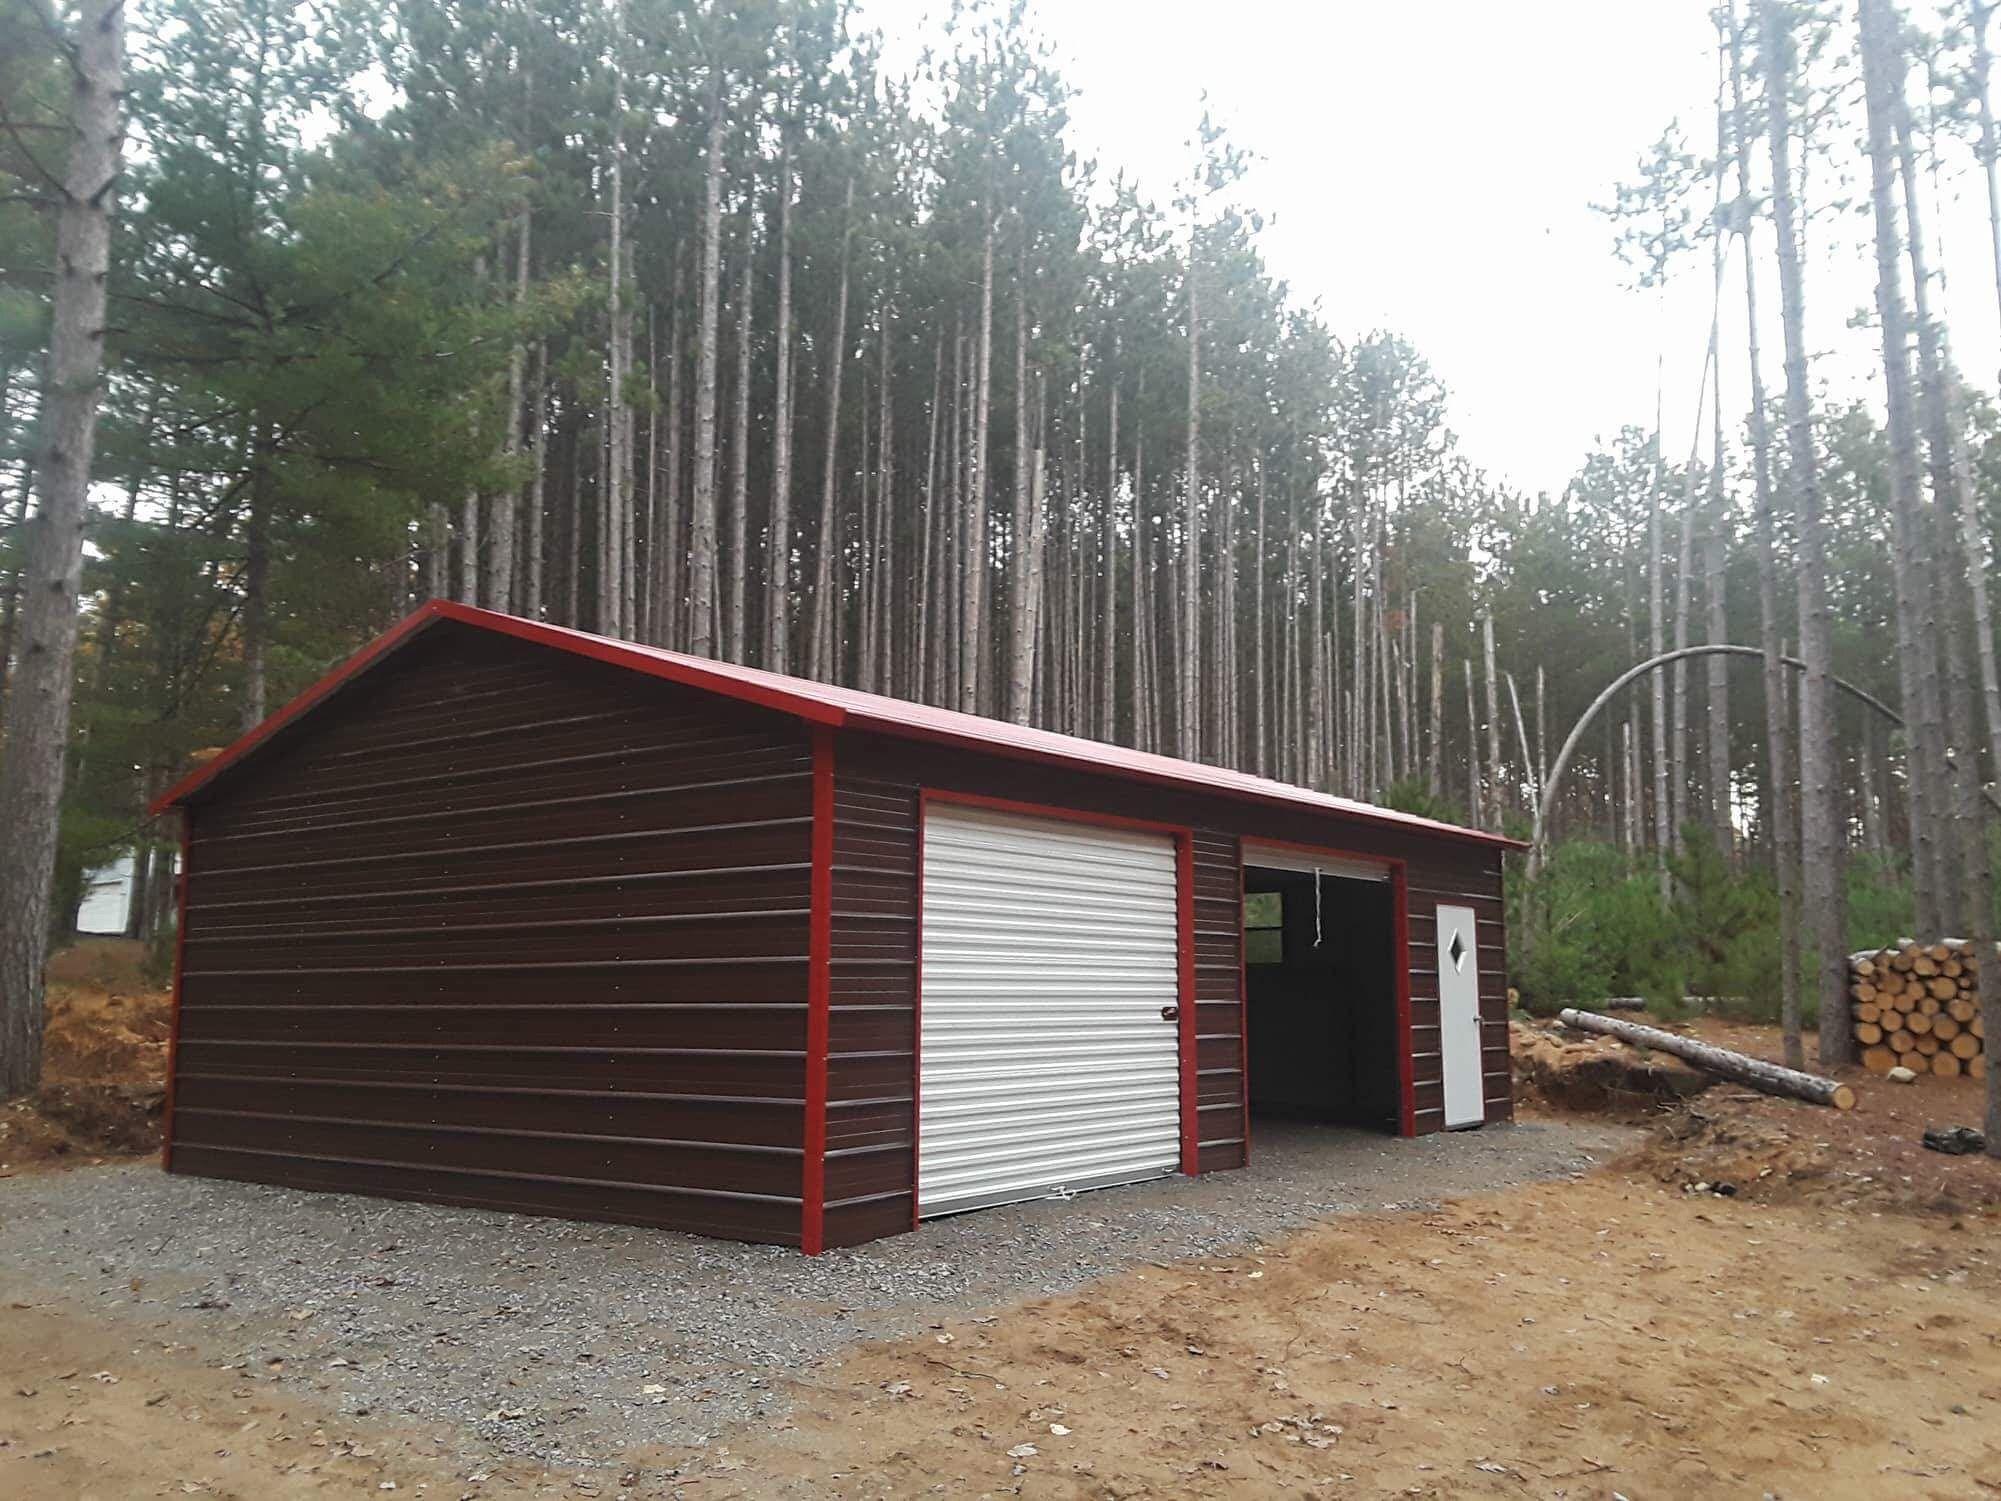 2 Car Metal Garage in Midland Michigan Midwest Steel Carports